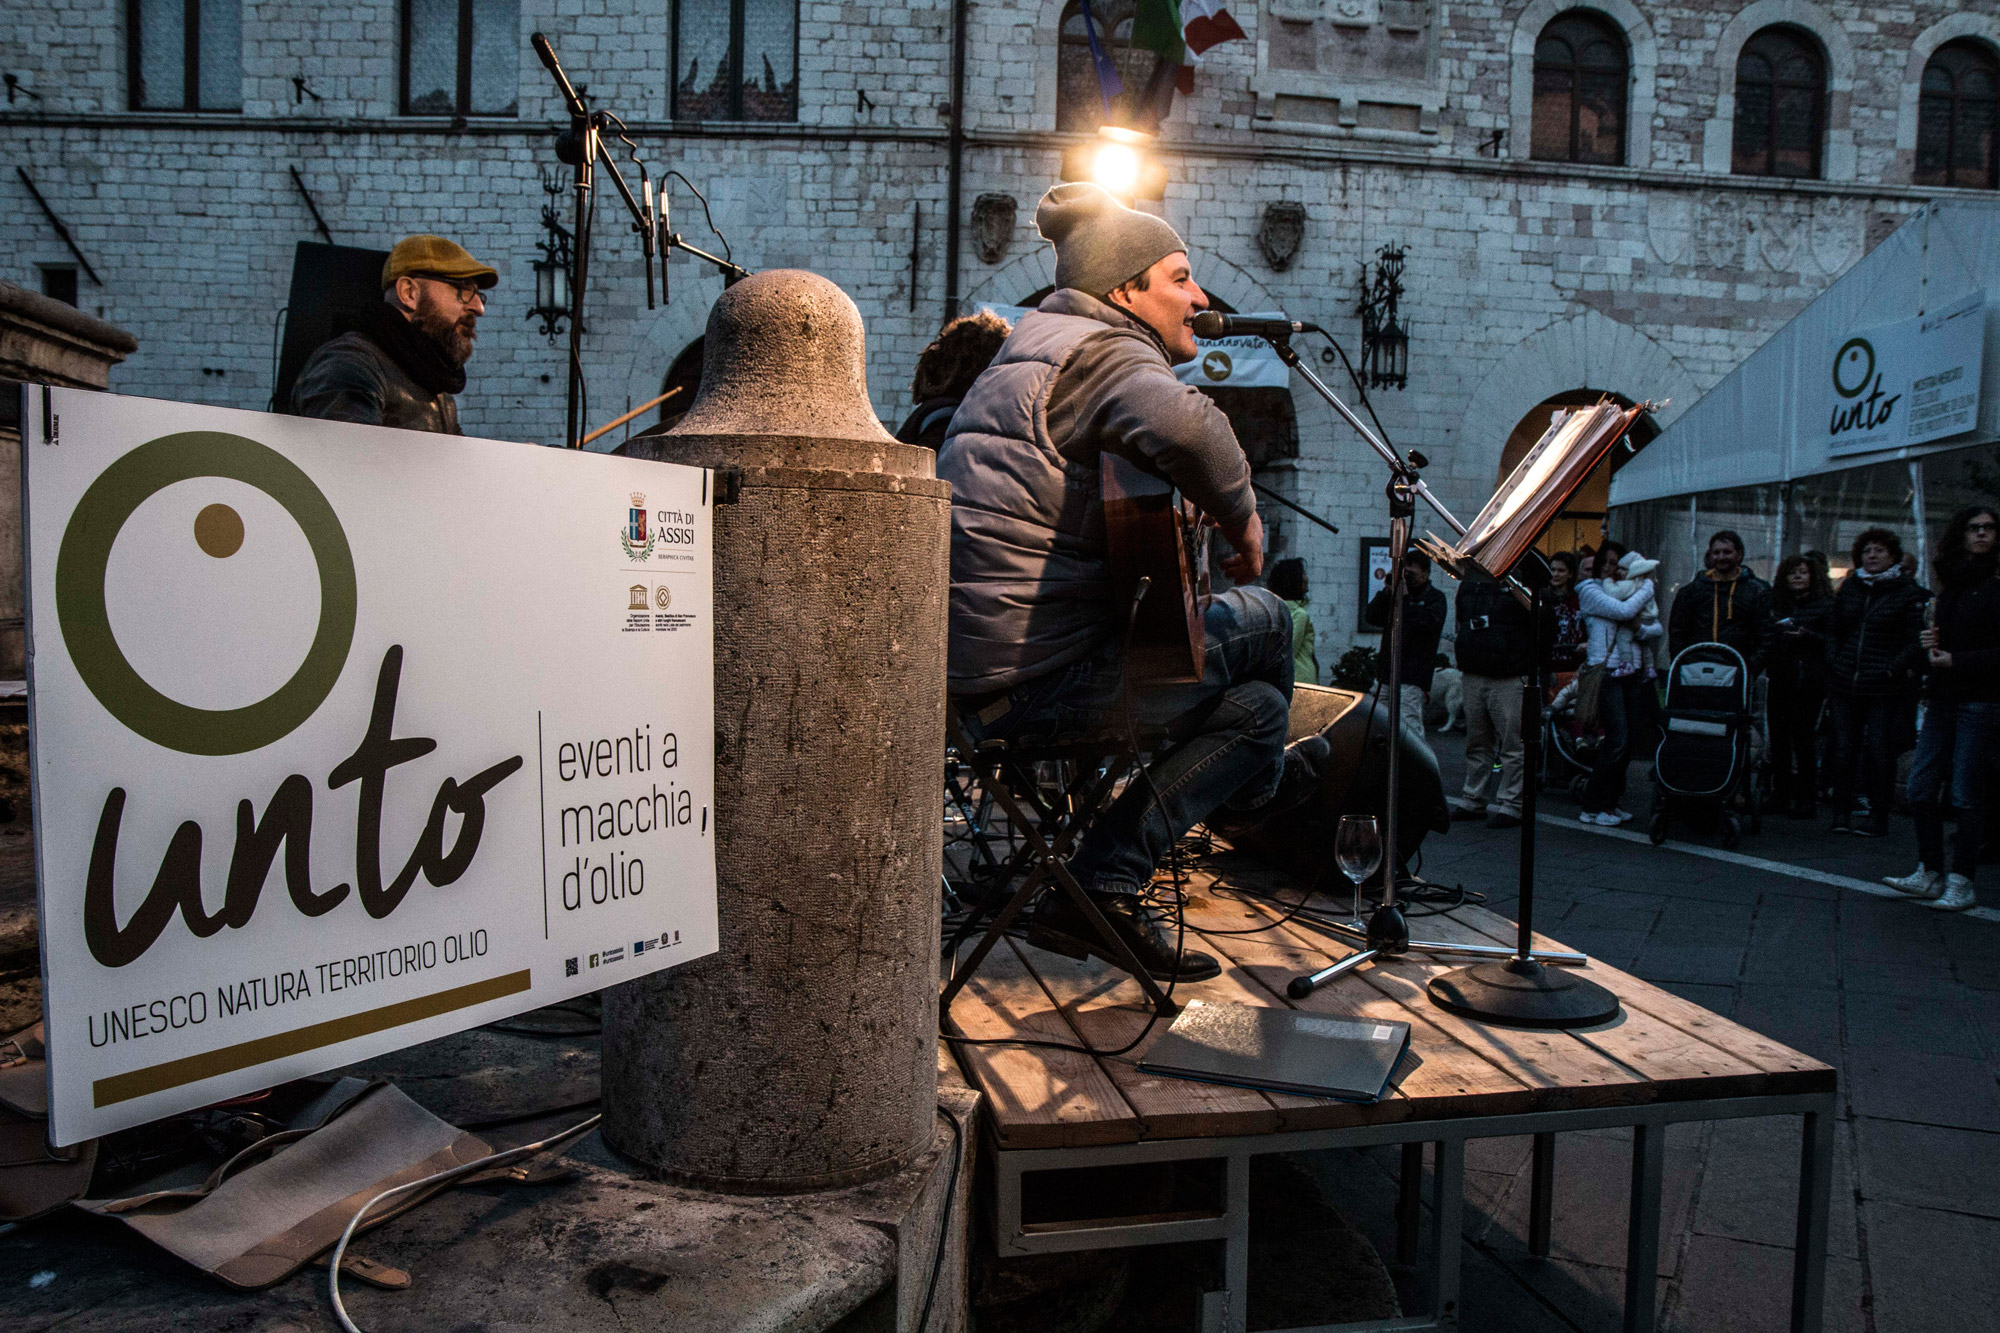 Concerti in piazza